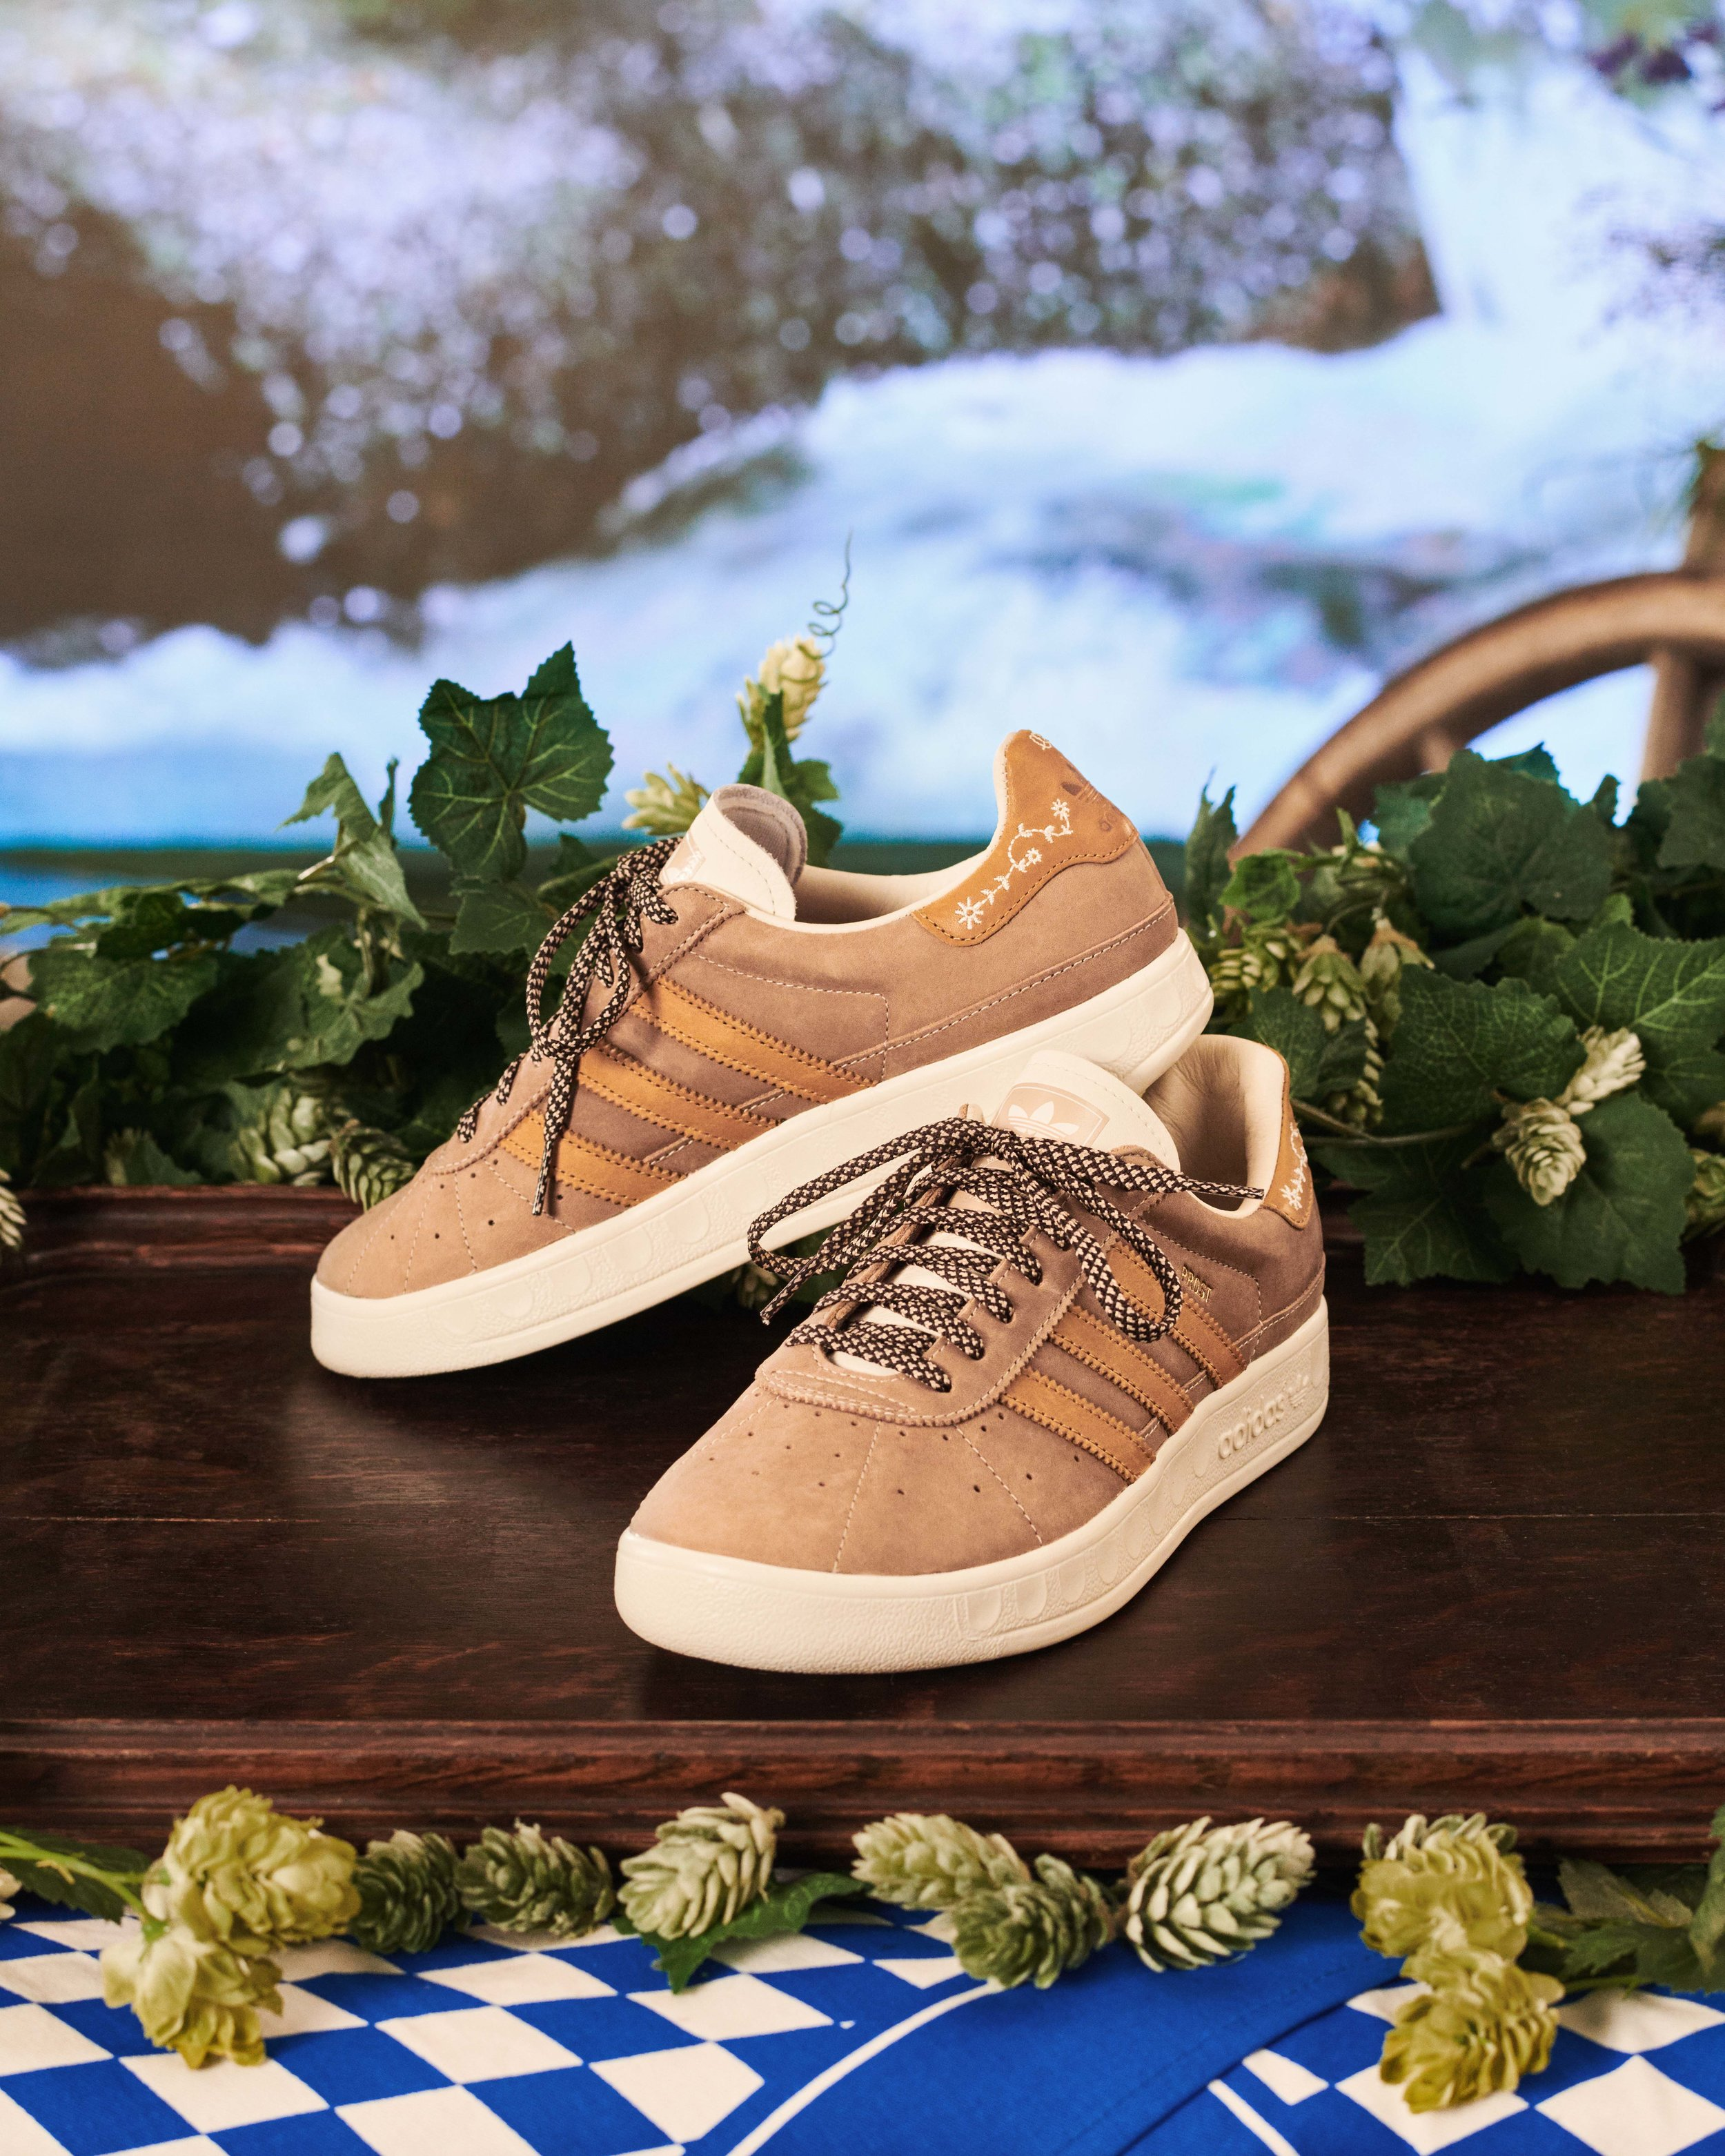 Adidas_MIG_Beige-6.jpg